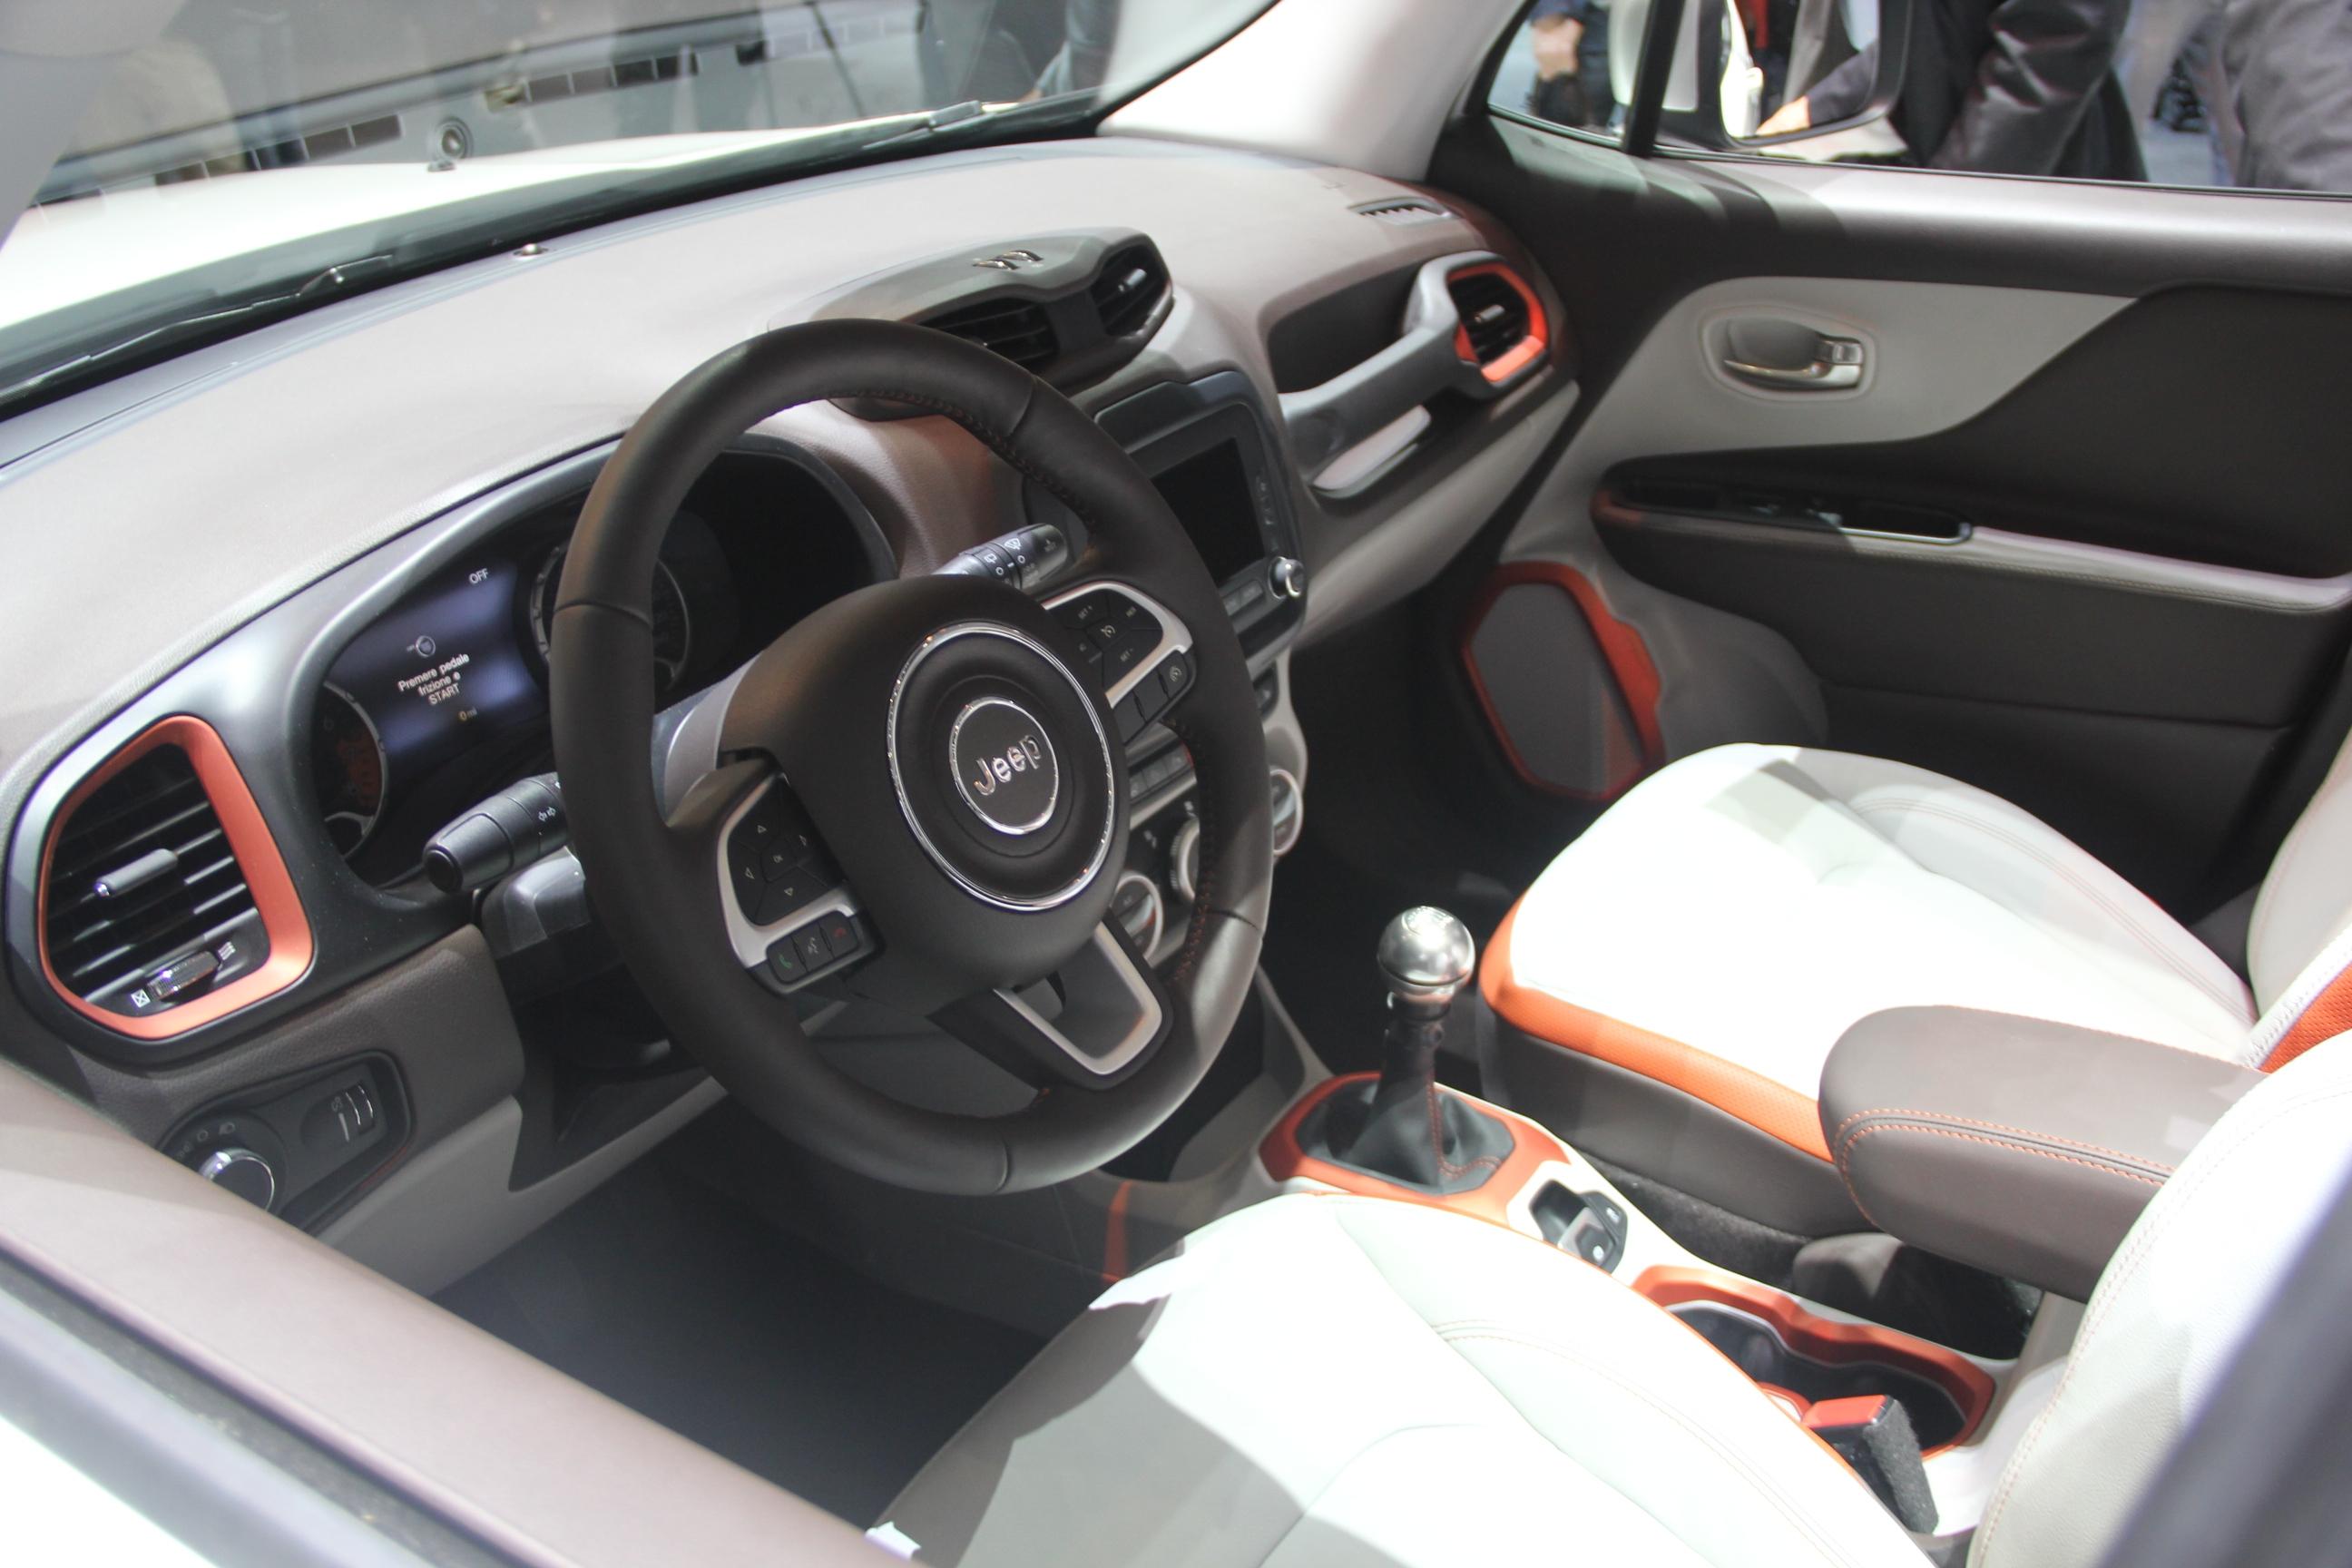 S0-En-direct-de-Geneve-2014-Jeep-Renegade-brute-de-decoffrage-315454